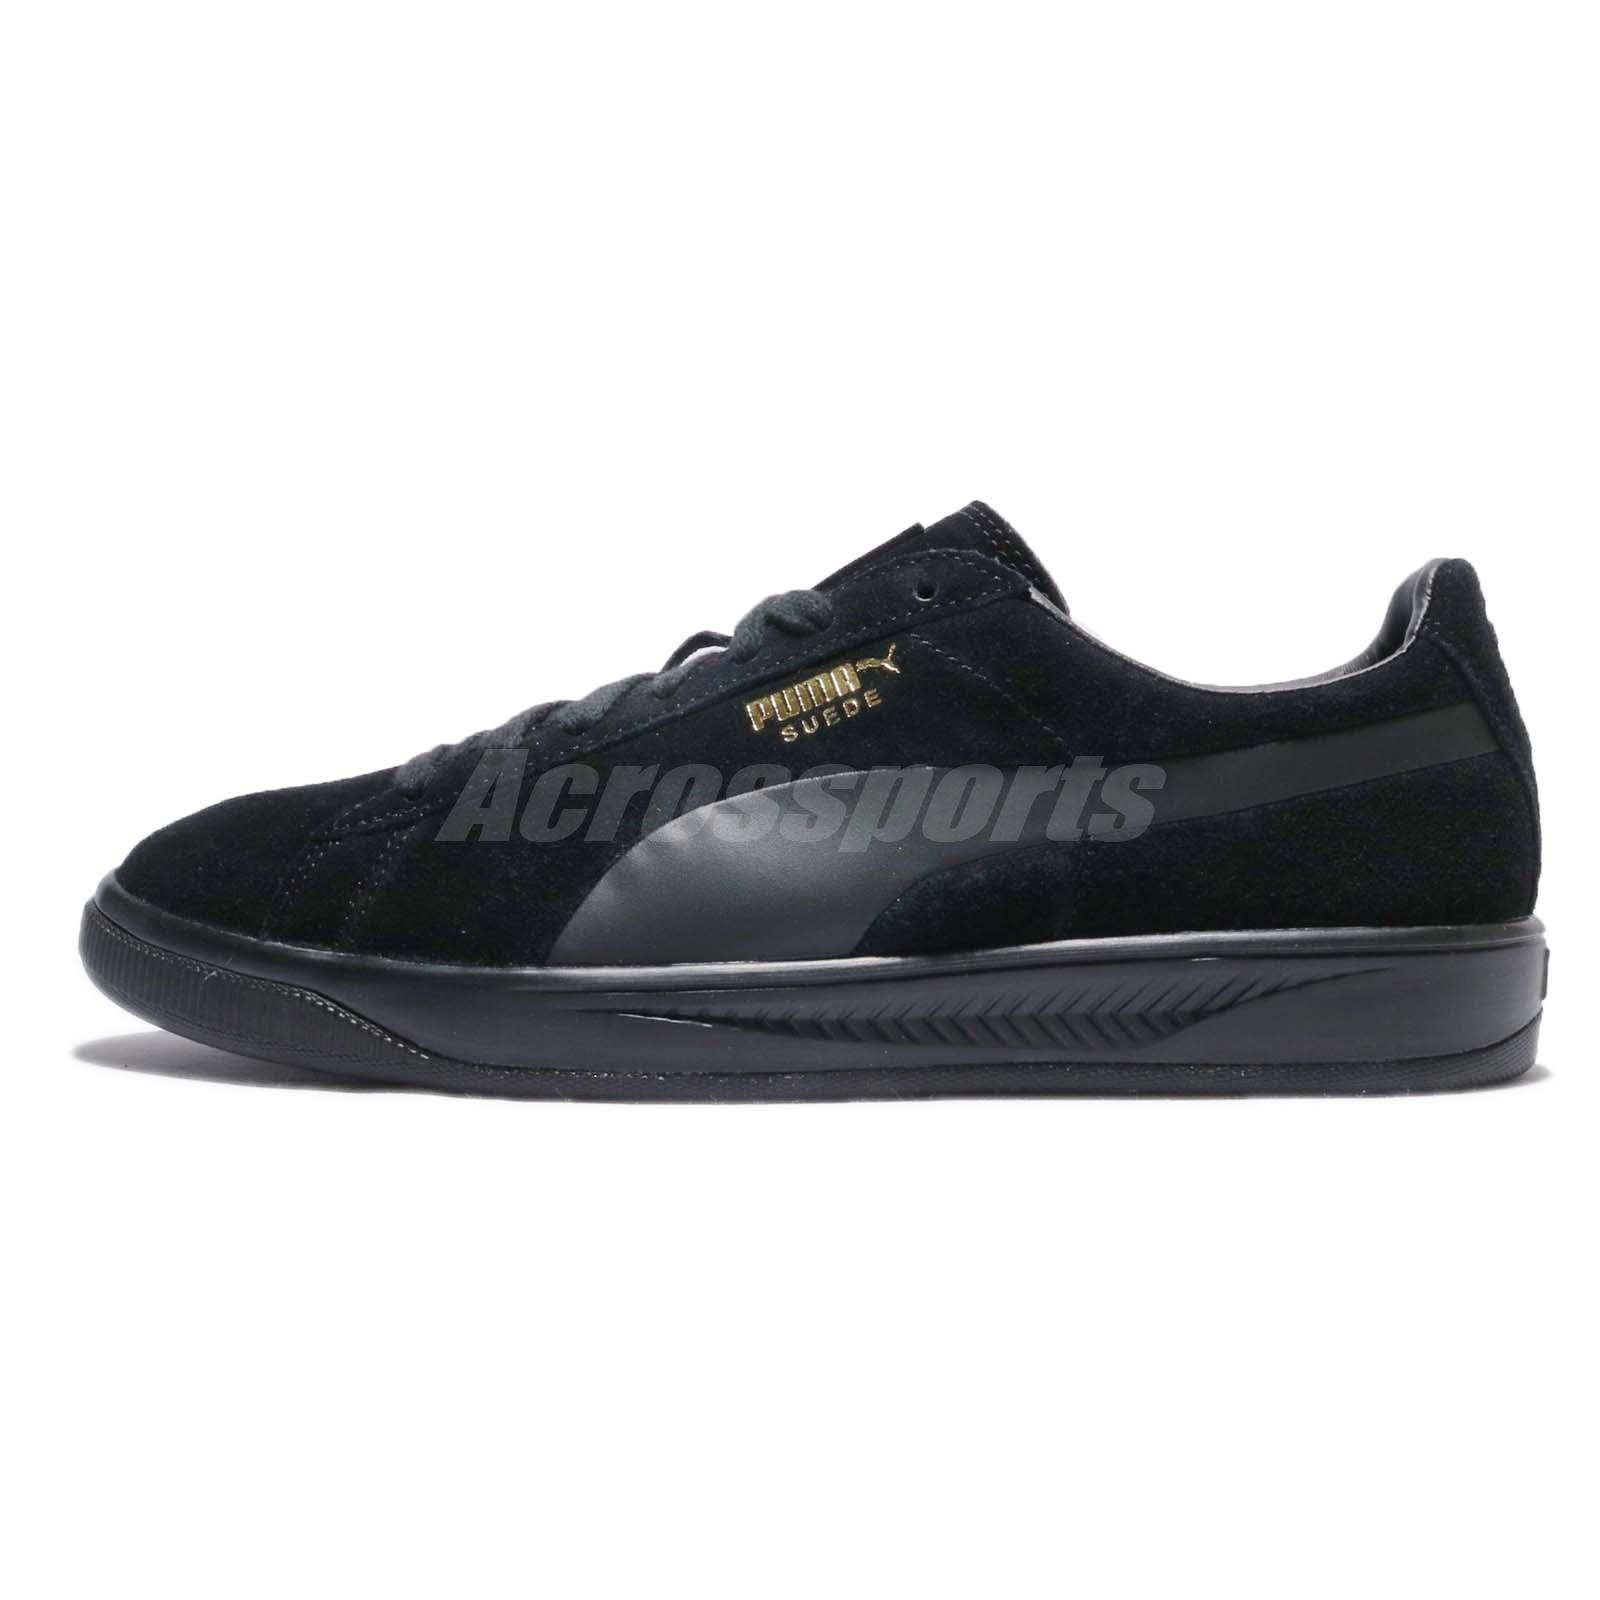 puma shoes suede black. puma suede ignite black gold men training shoes sneakers casual 364069-05